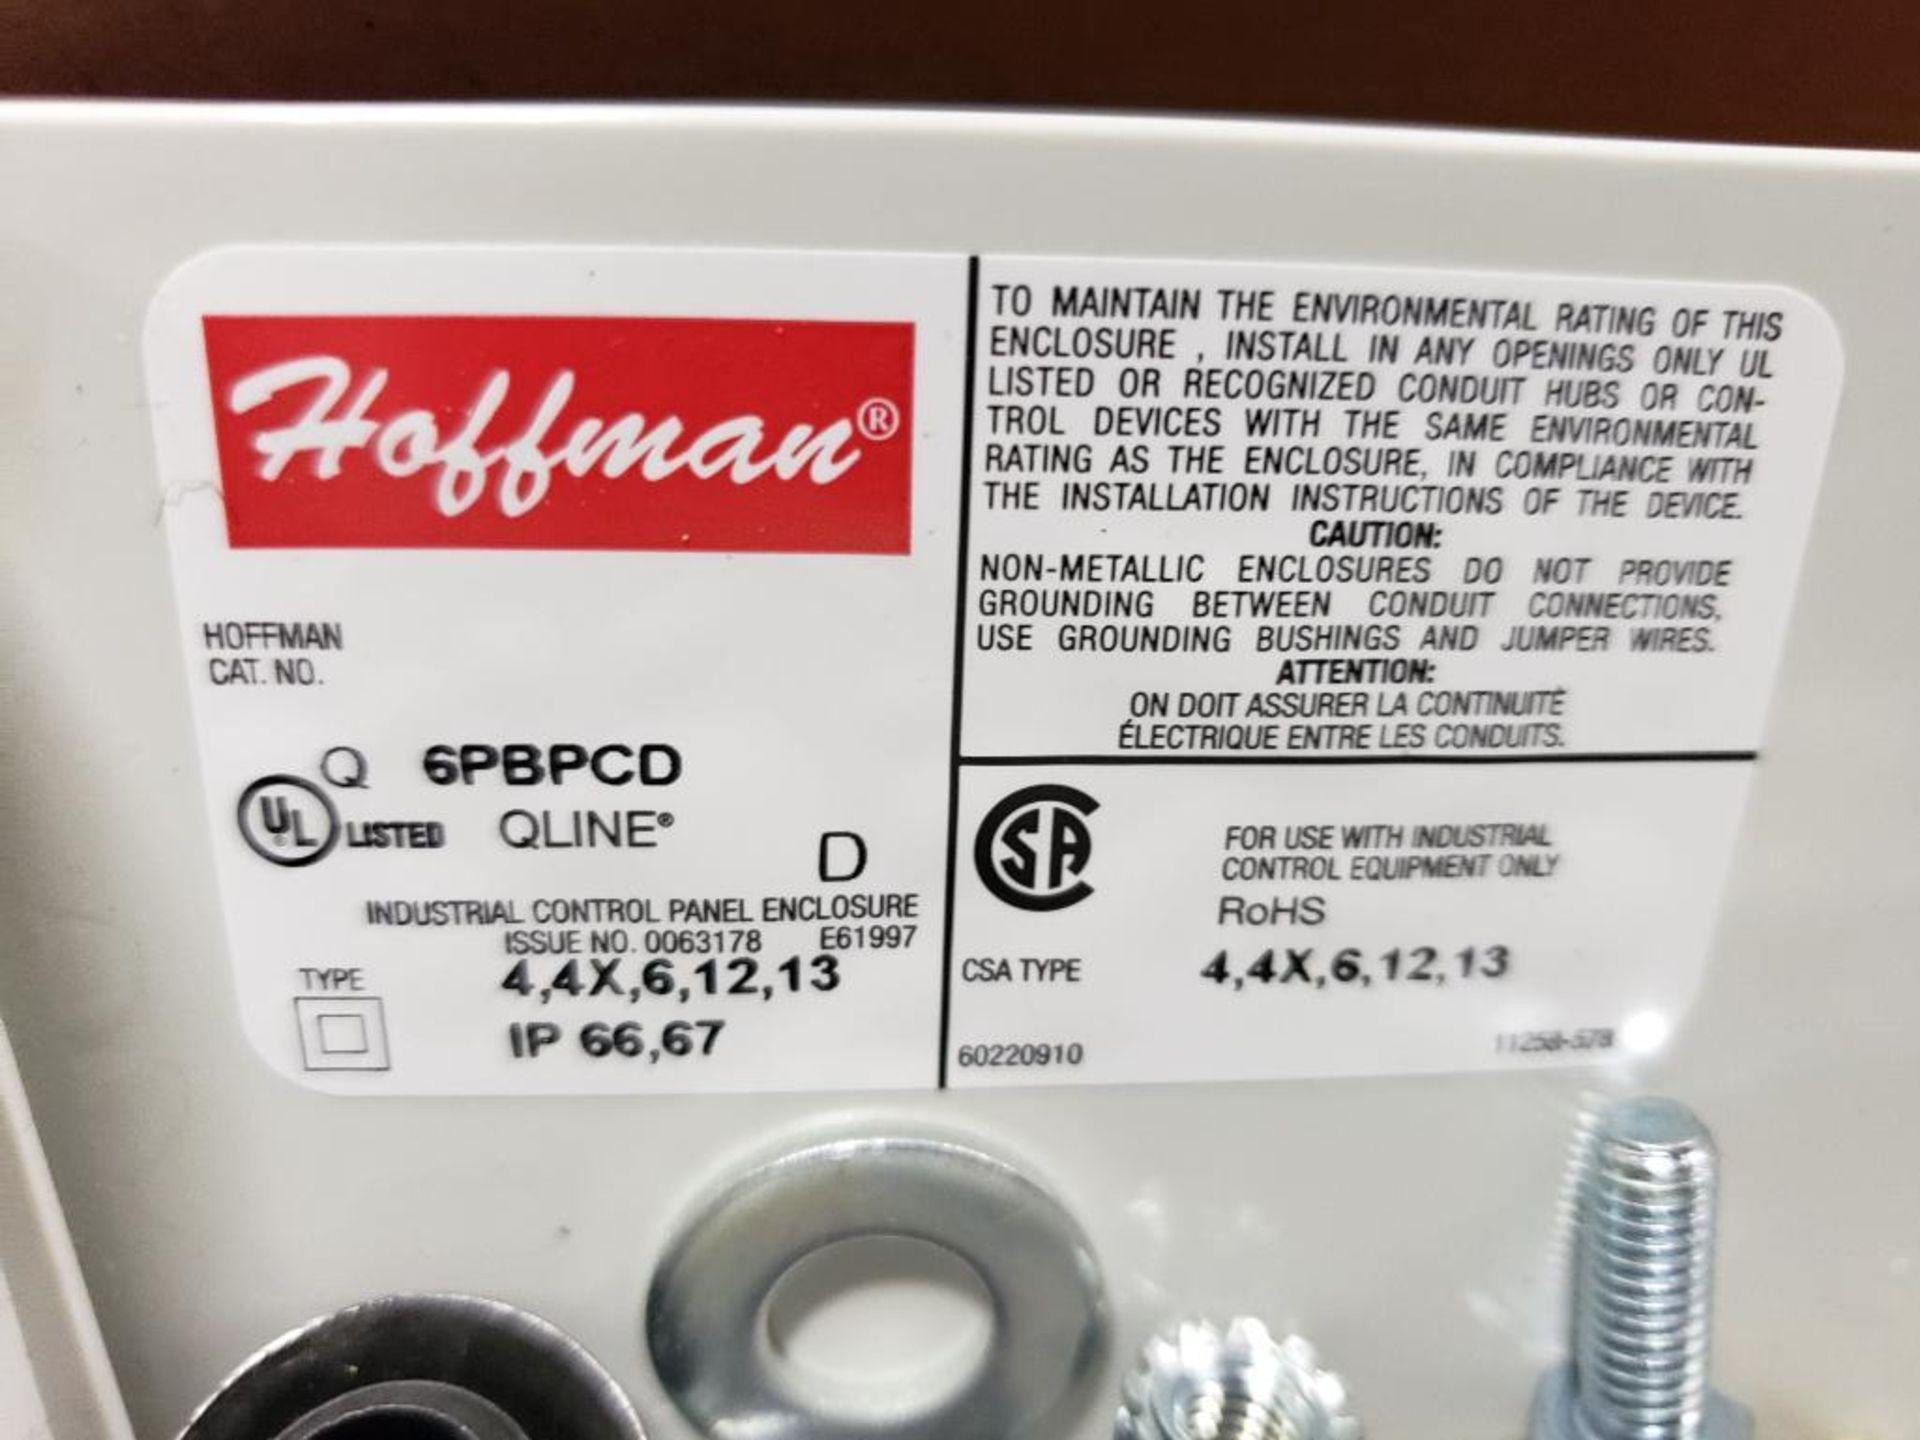 Qty 2 - Hoffman 6PBPCD Conduit box. - Image 4 of 5